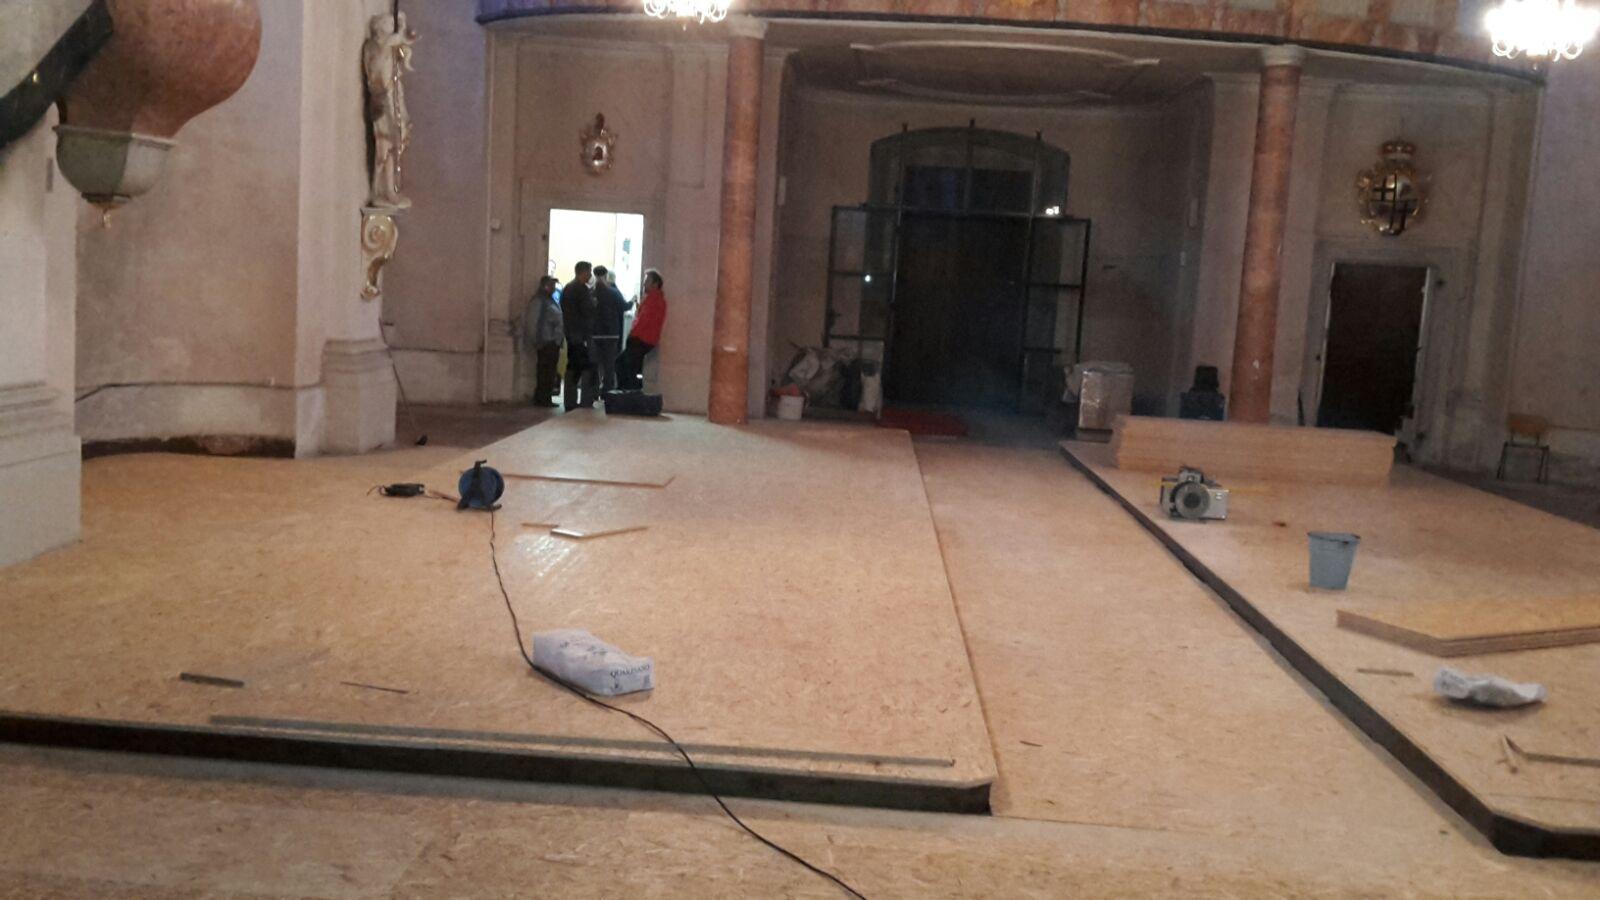 Osb Fußbodenplatten Verlegen ~ Katholische pfarrgemeinde mariä himmelfahrt zellabildergalerie